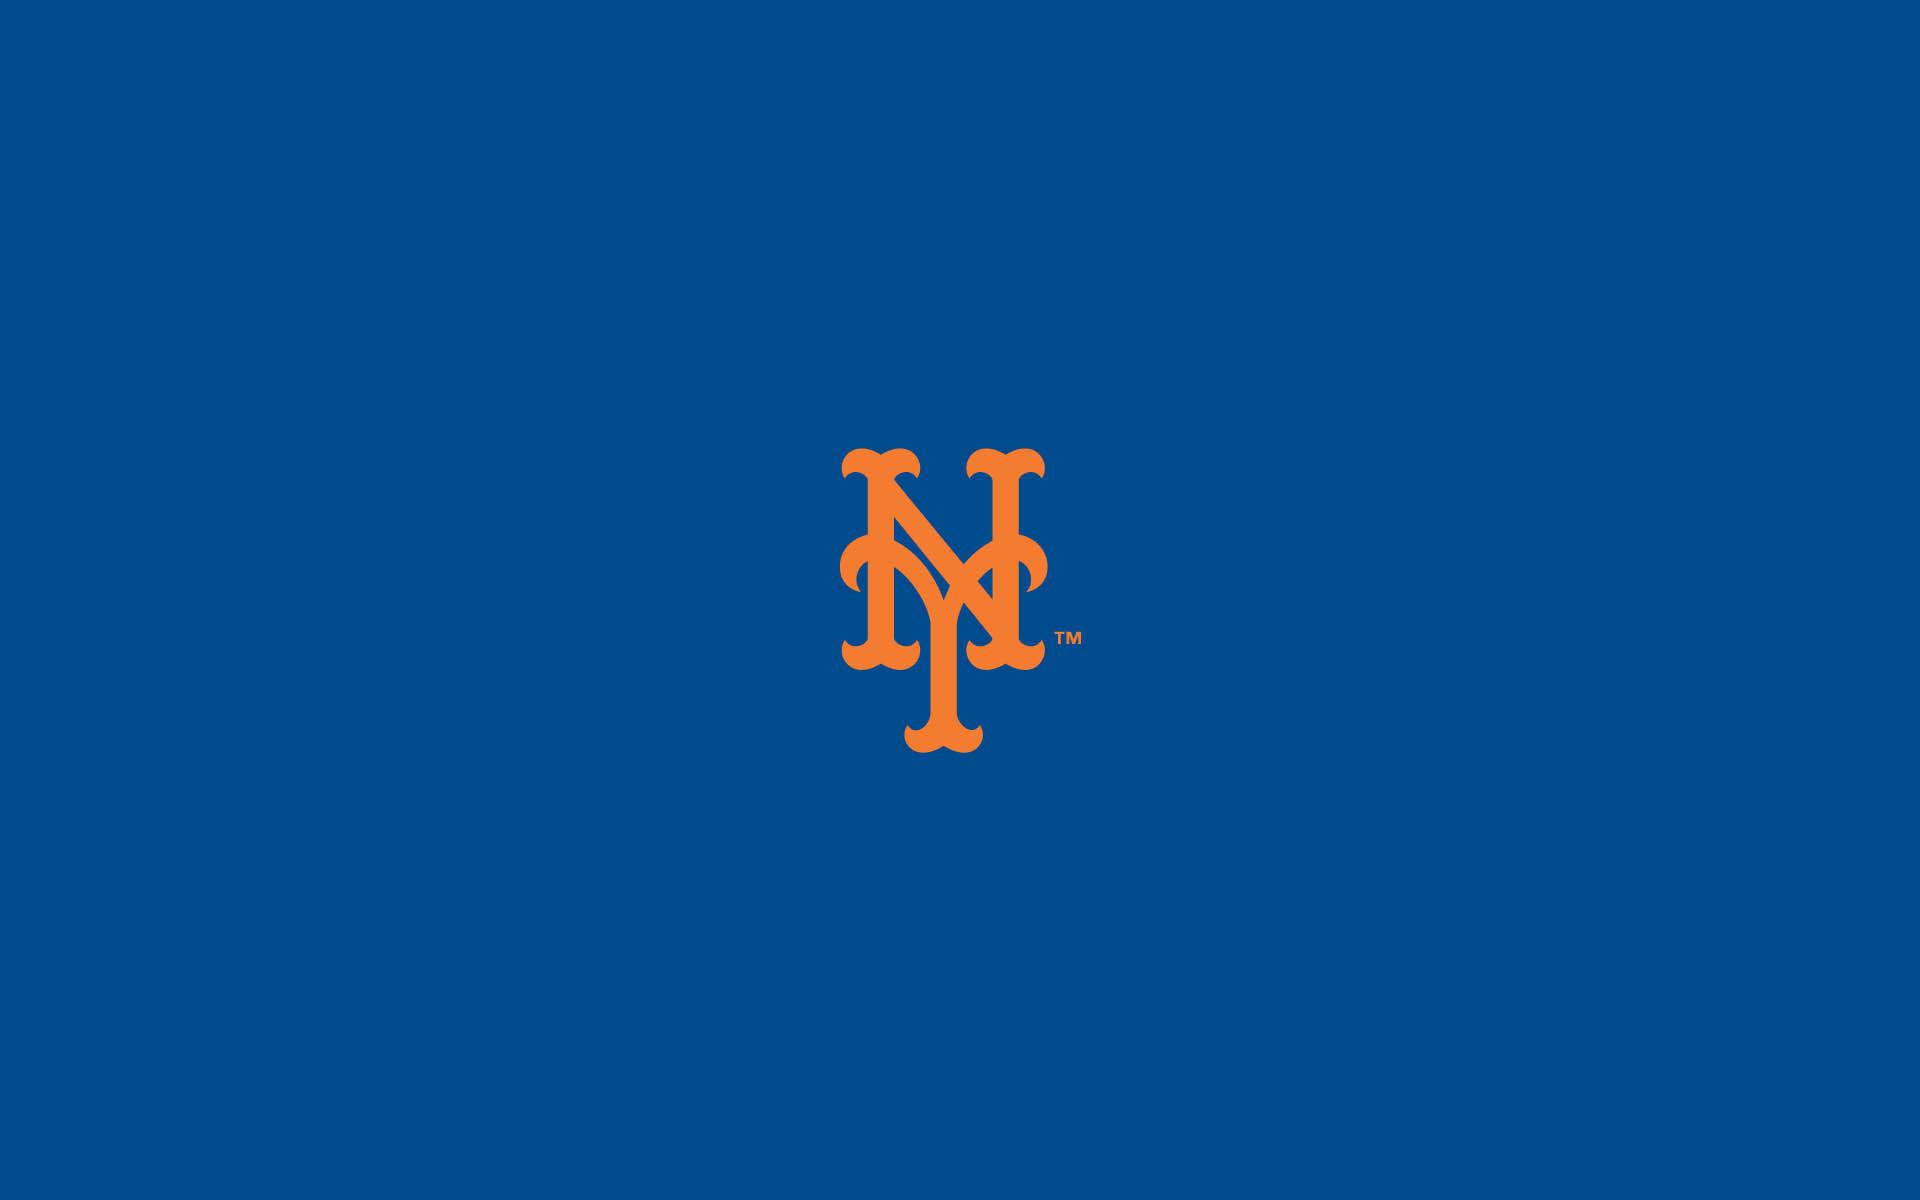 New York Mets Deskto